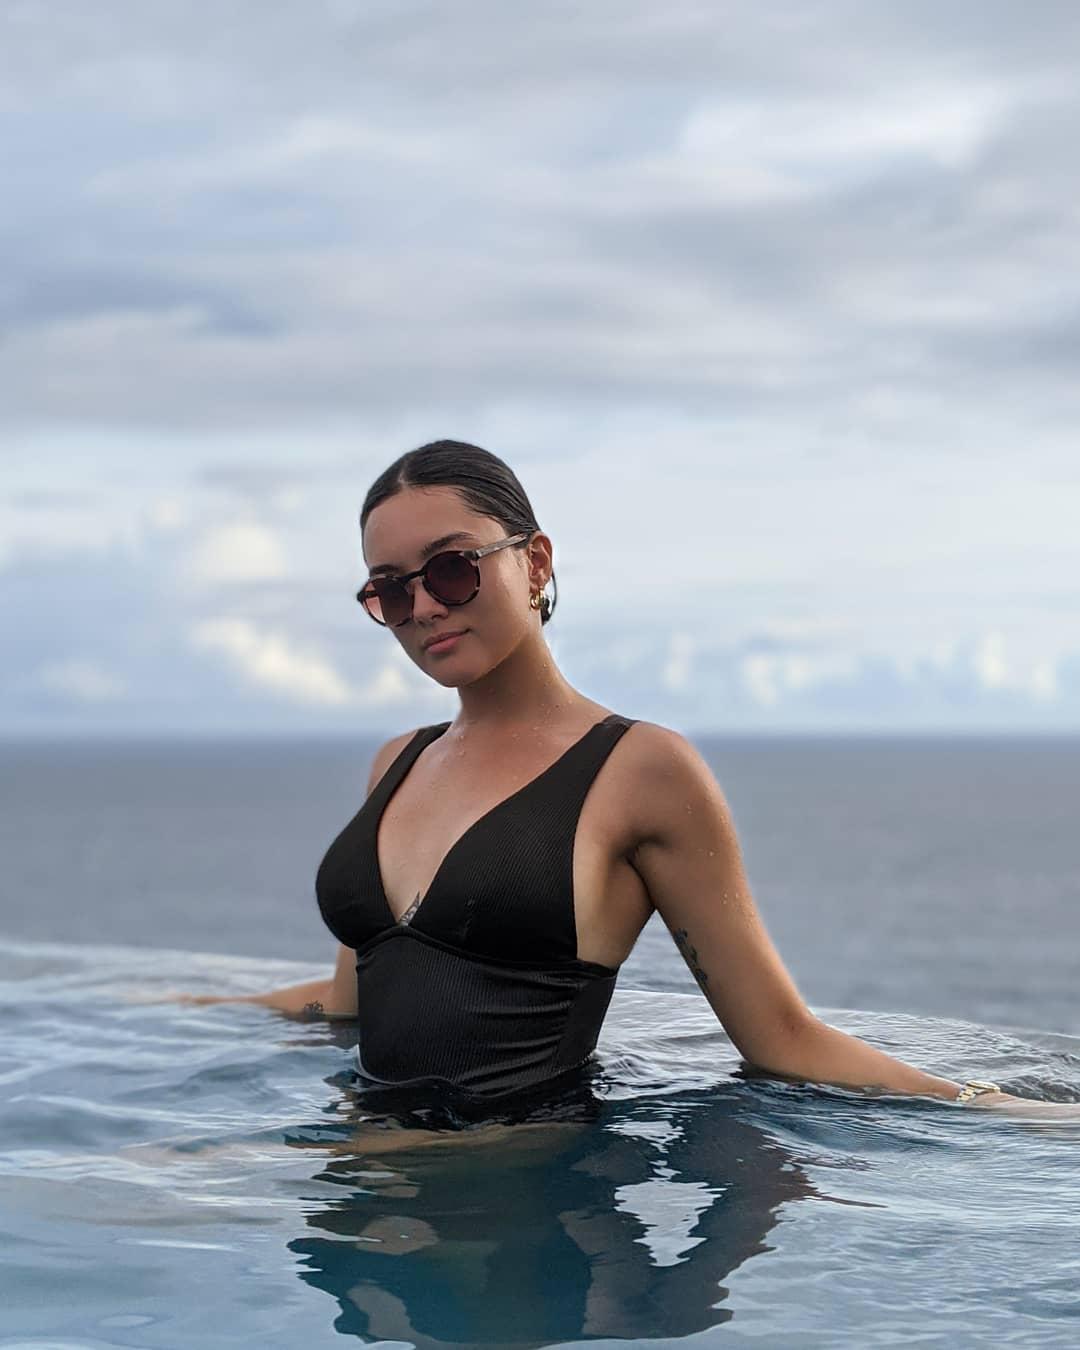 lauren reid swimsuit poses